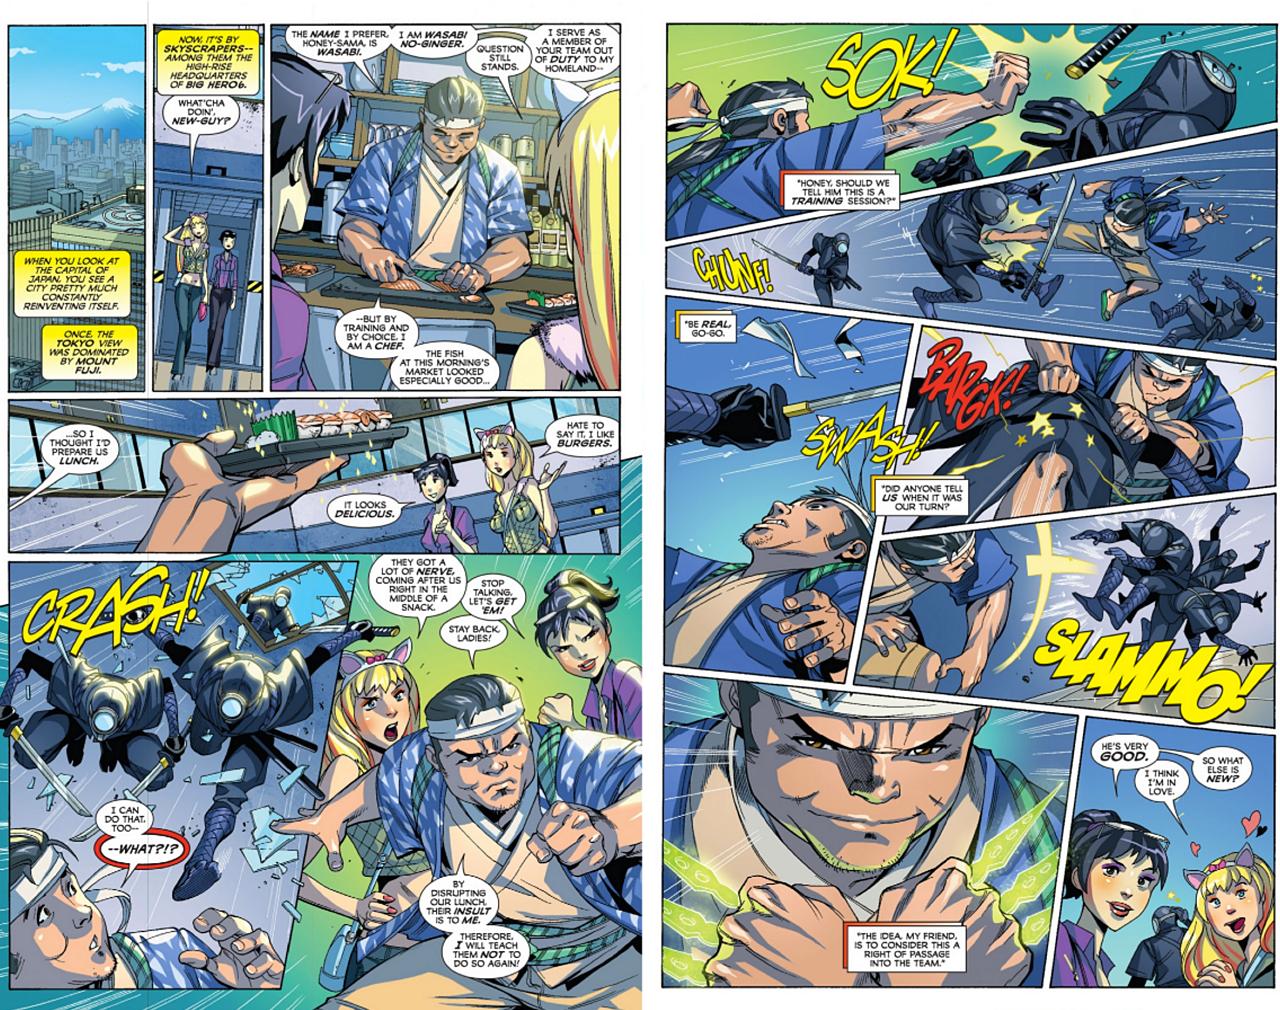 Big Hero Comic big hero 6 comic page 7bluehoung617 on deviantart